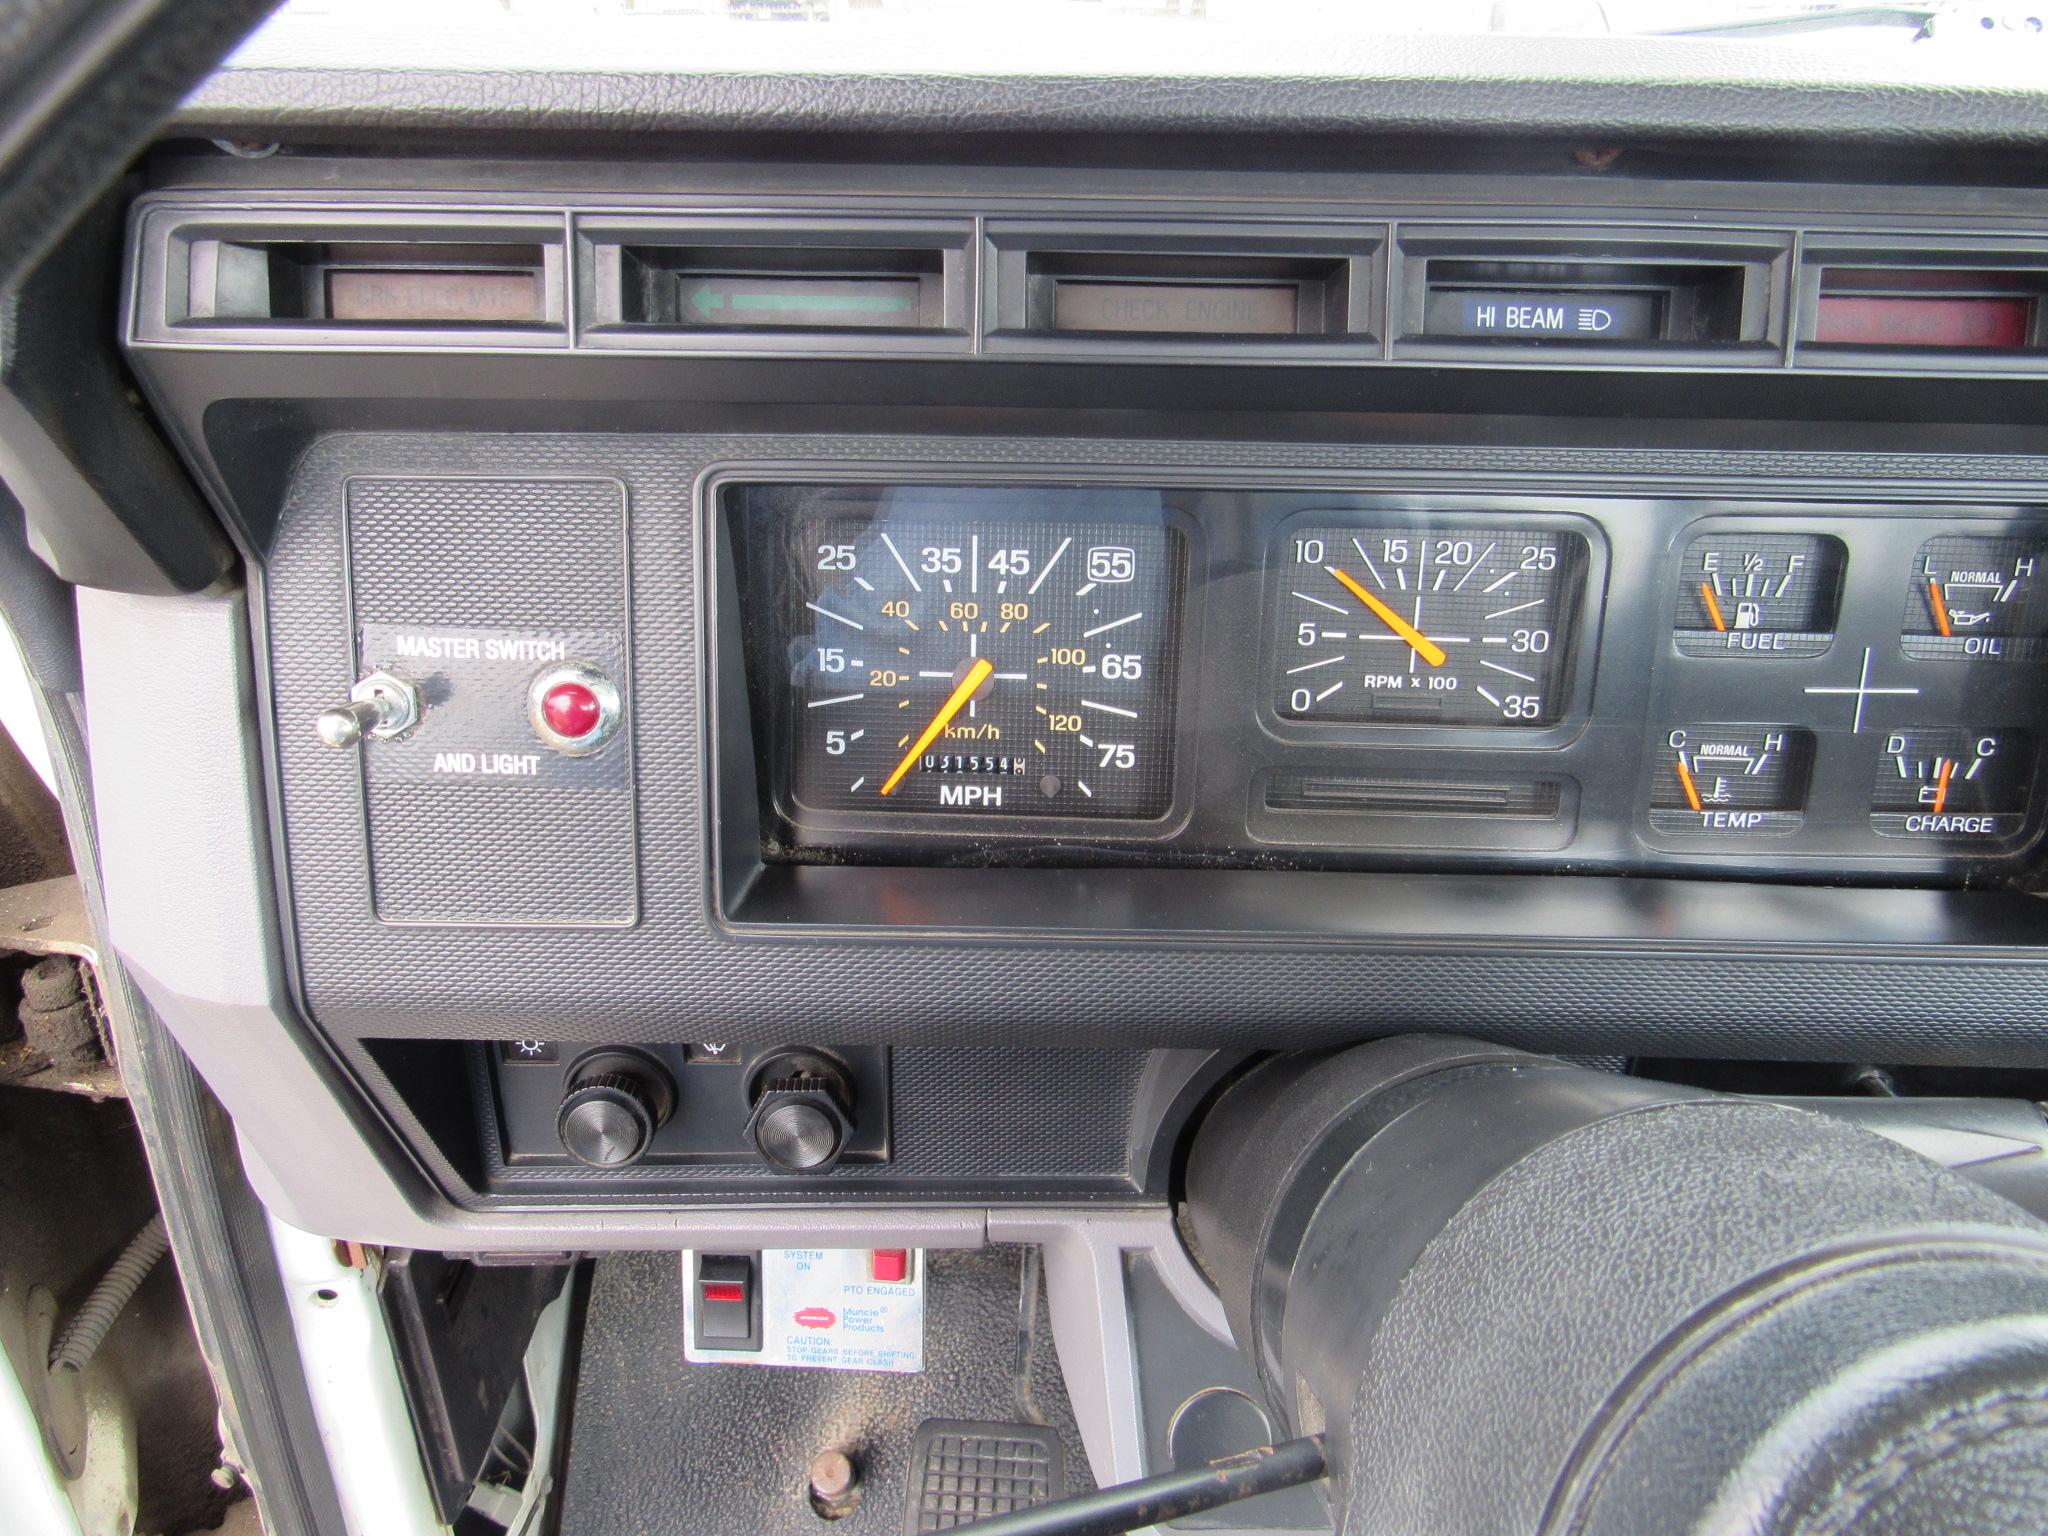 Teco V5 -55 dash